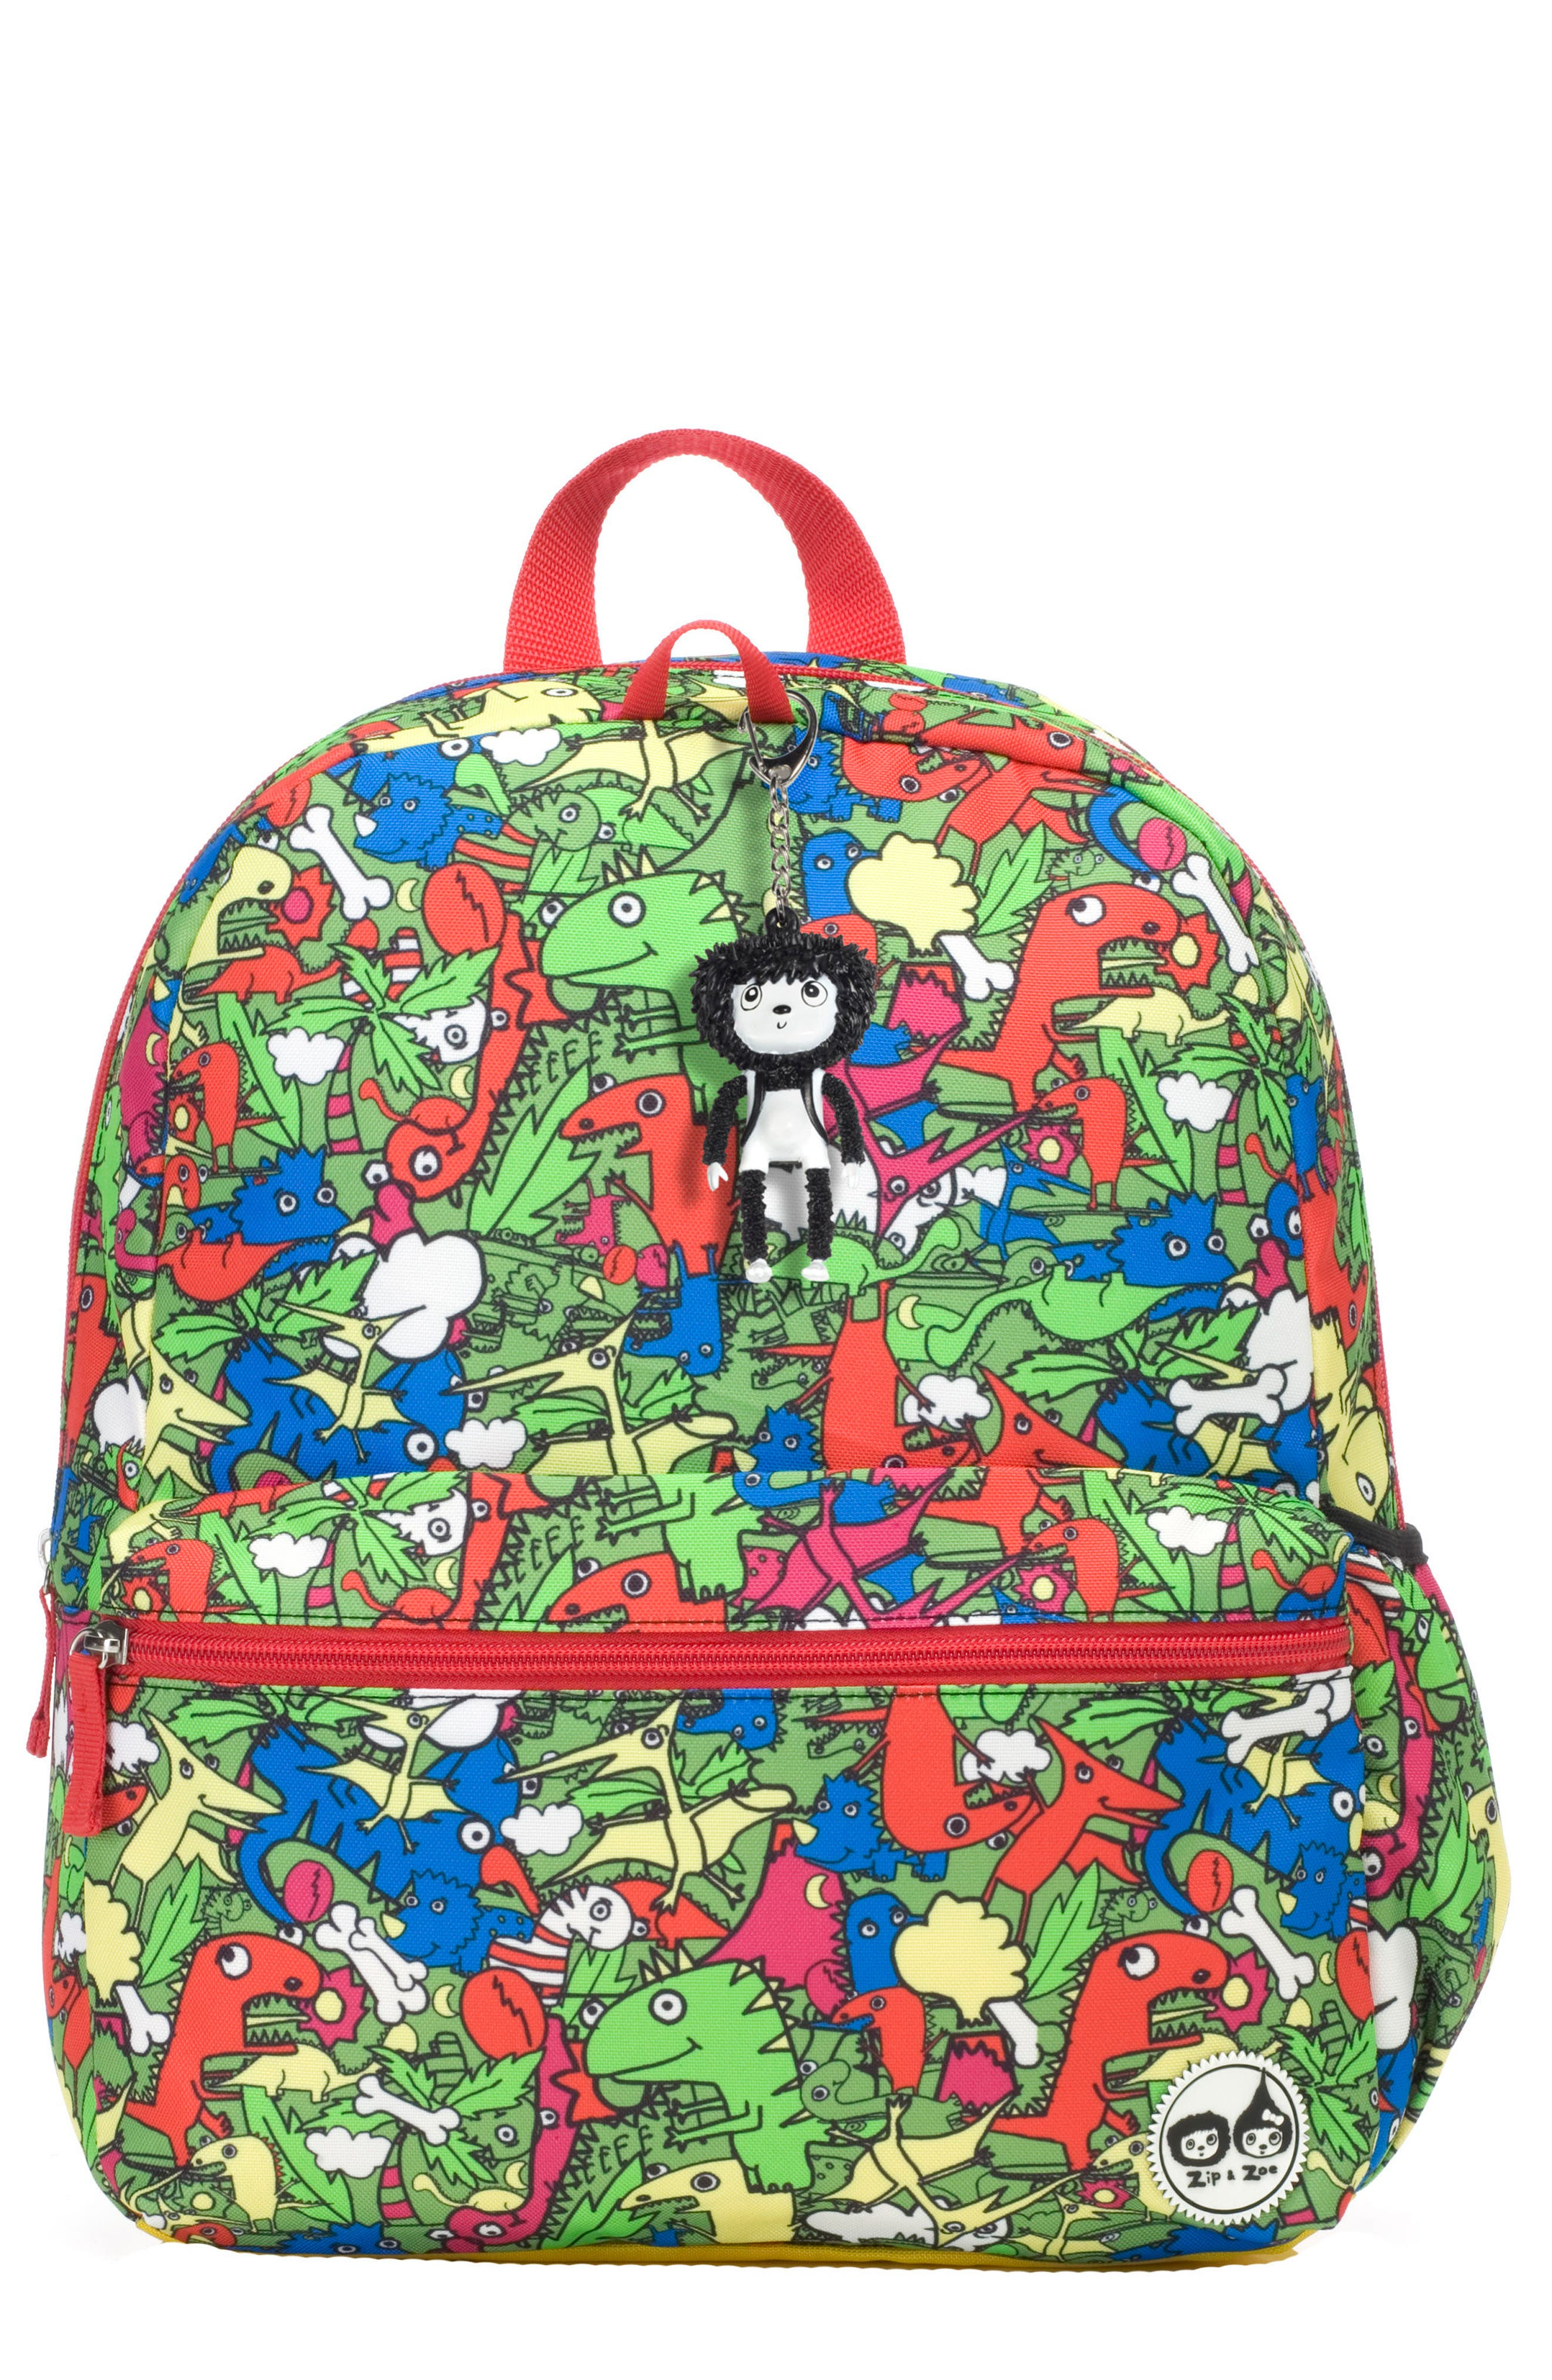 Zip & Zoe Dino Junior Backpack,                             Main thumbnail 1, color,                             DINO